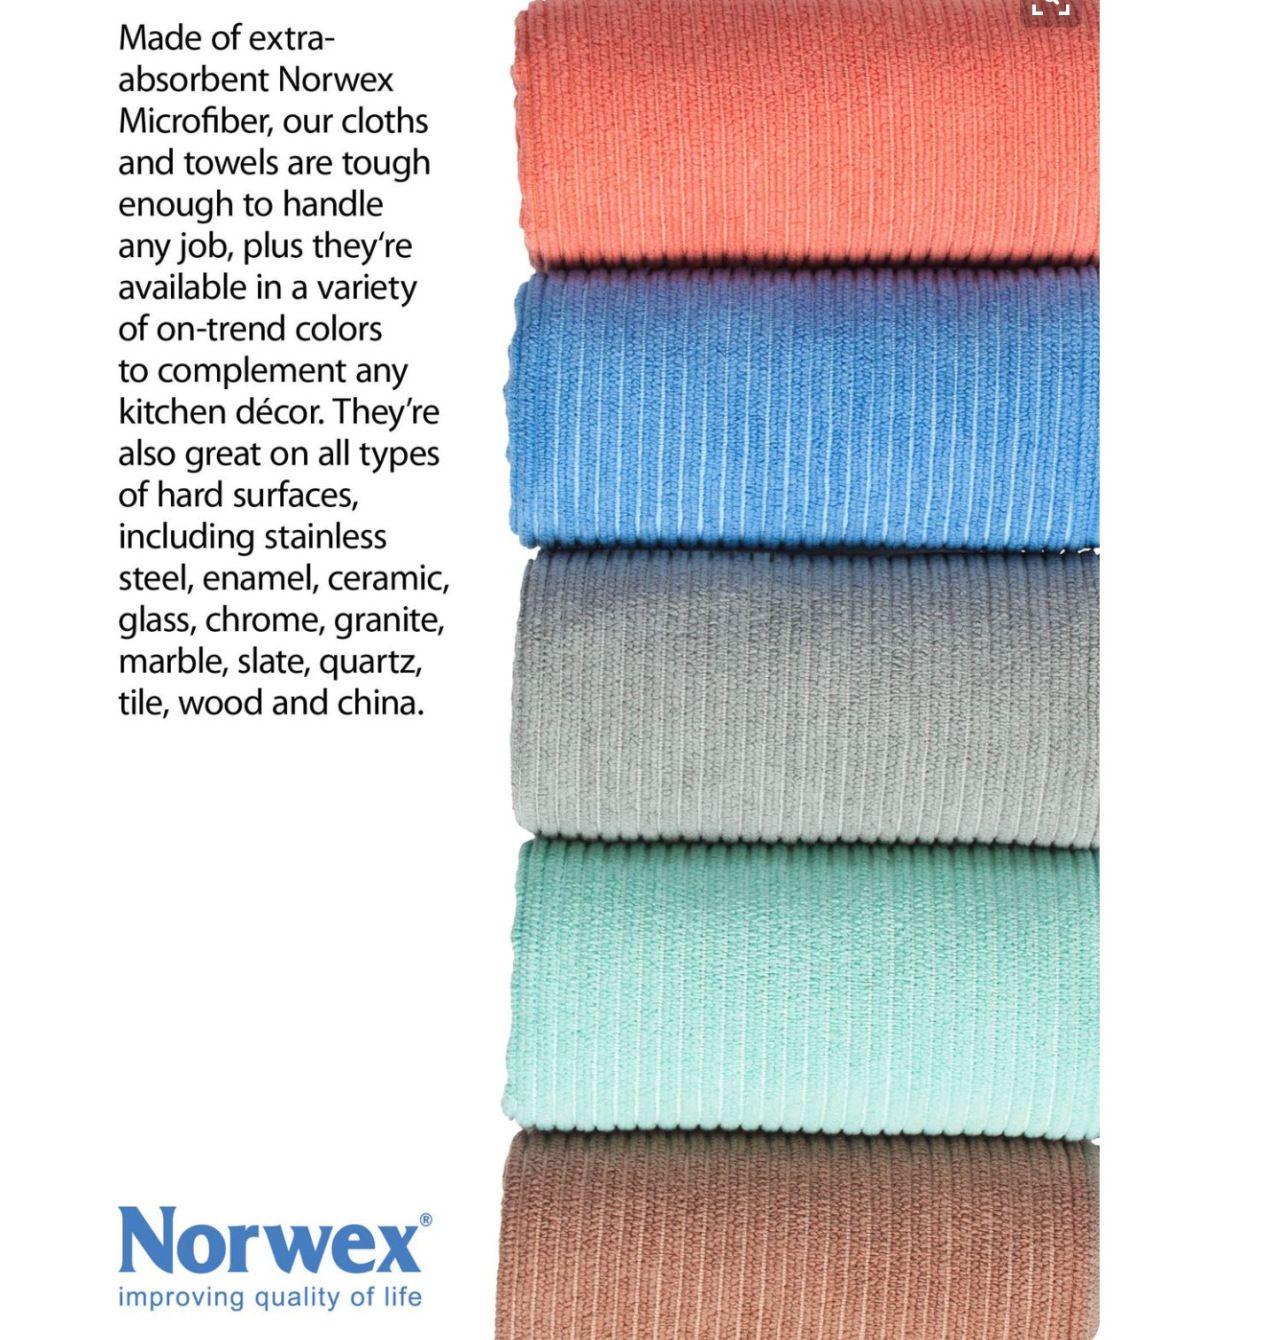 Kitchen Cloth Norwex Norwex Cleaning Norwex Cloths